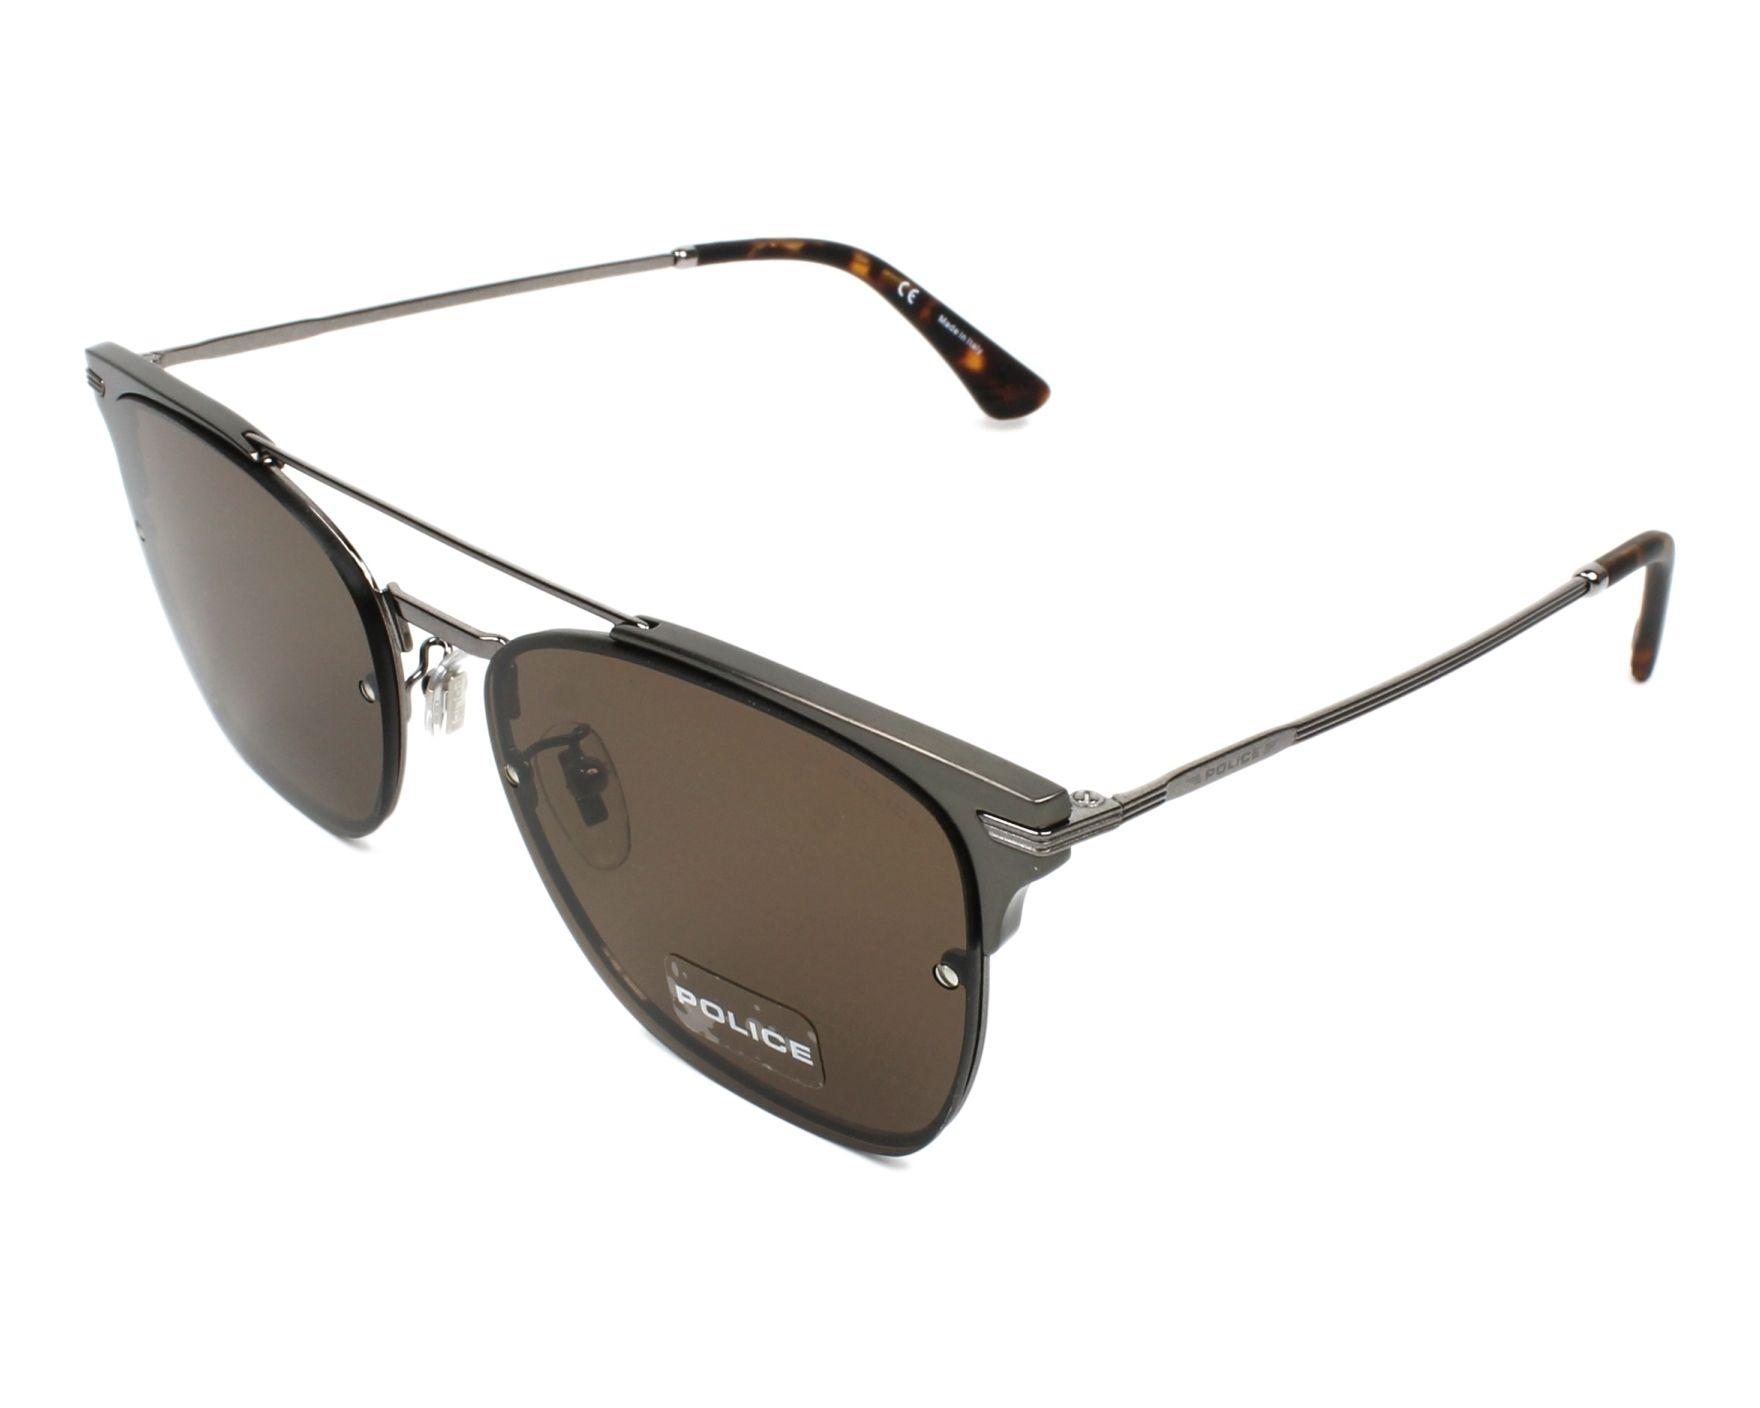 63edae5cebd Sunglasses Police SPL-577 0568 - Gun Gun profile view